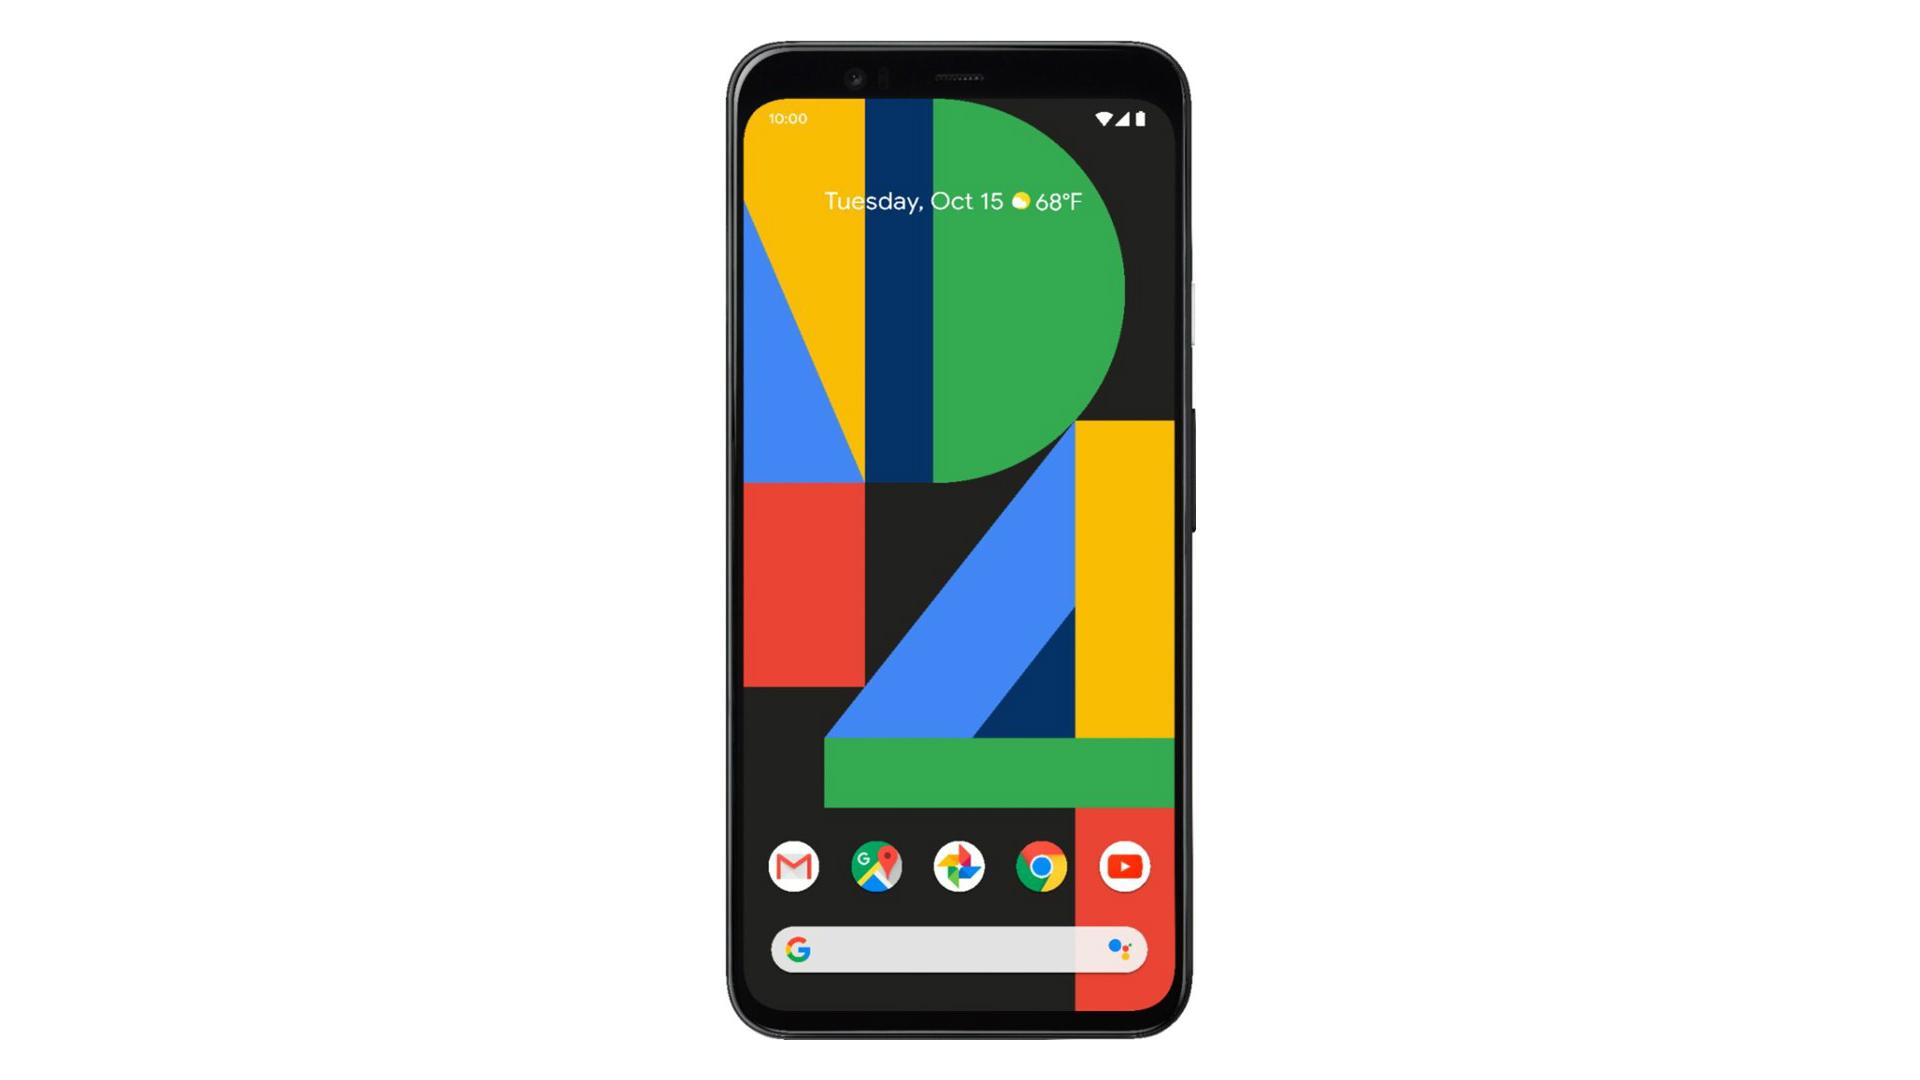 Google Pixel 4 XL press render